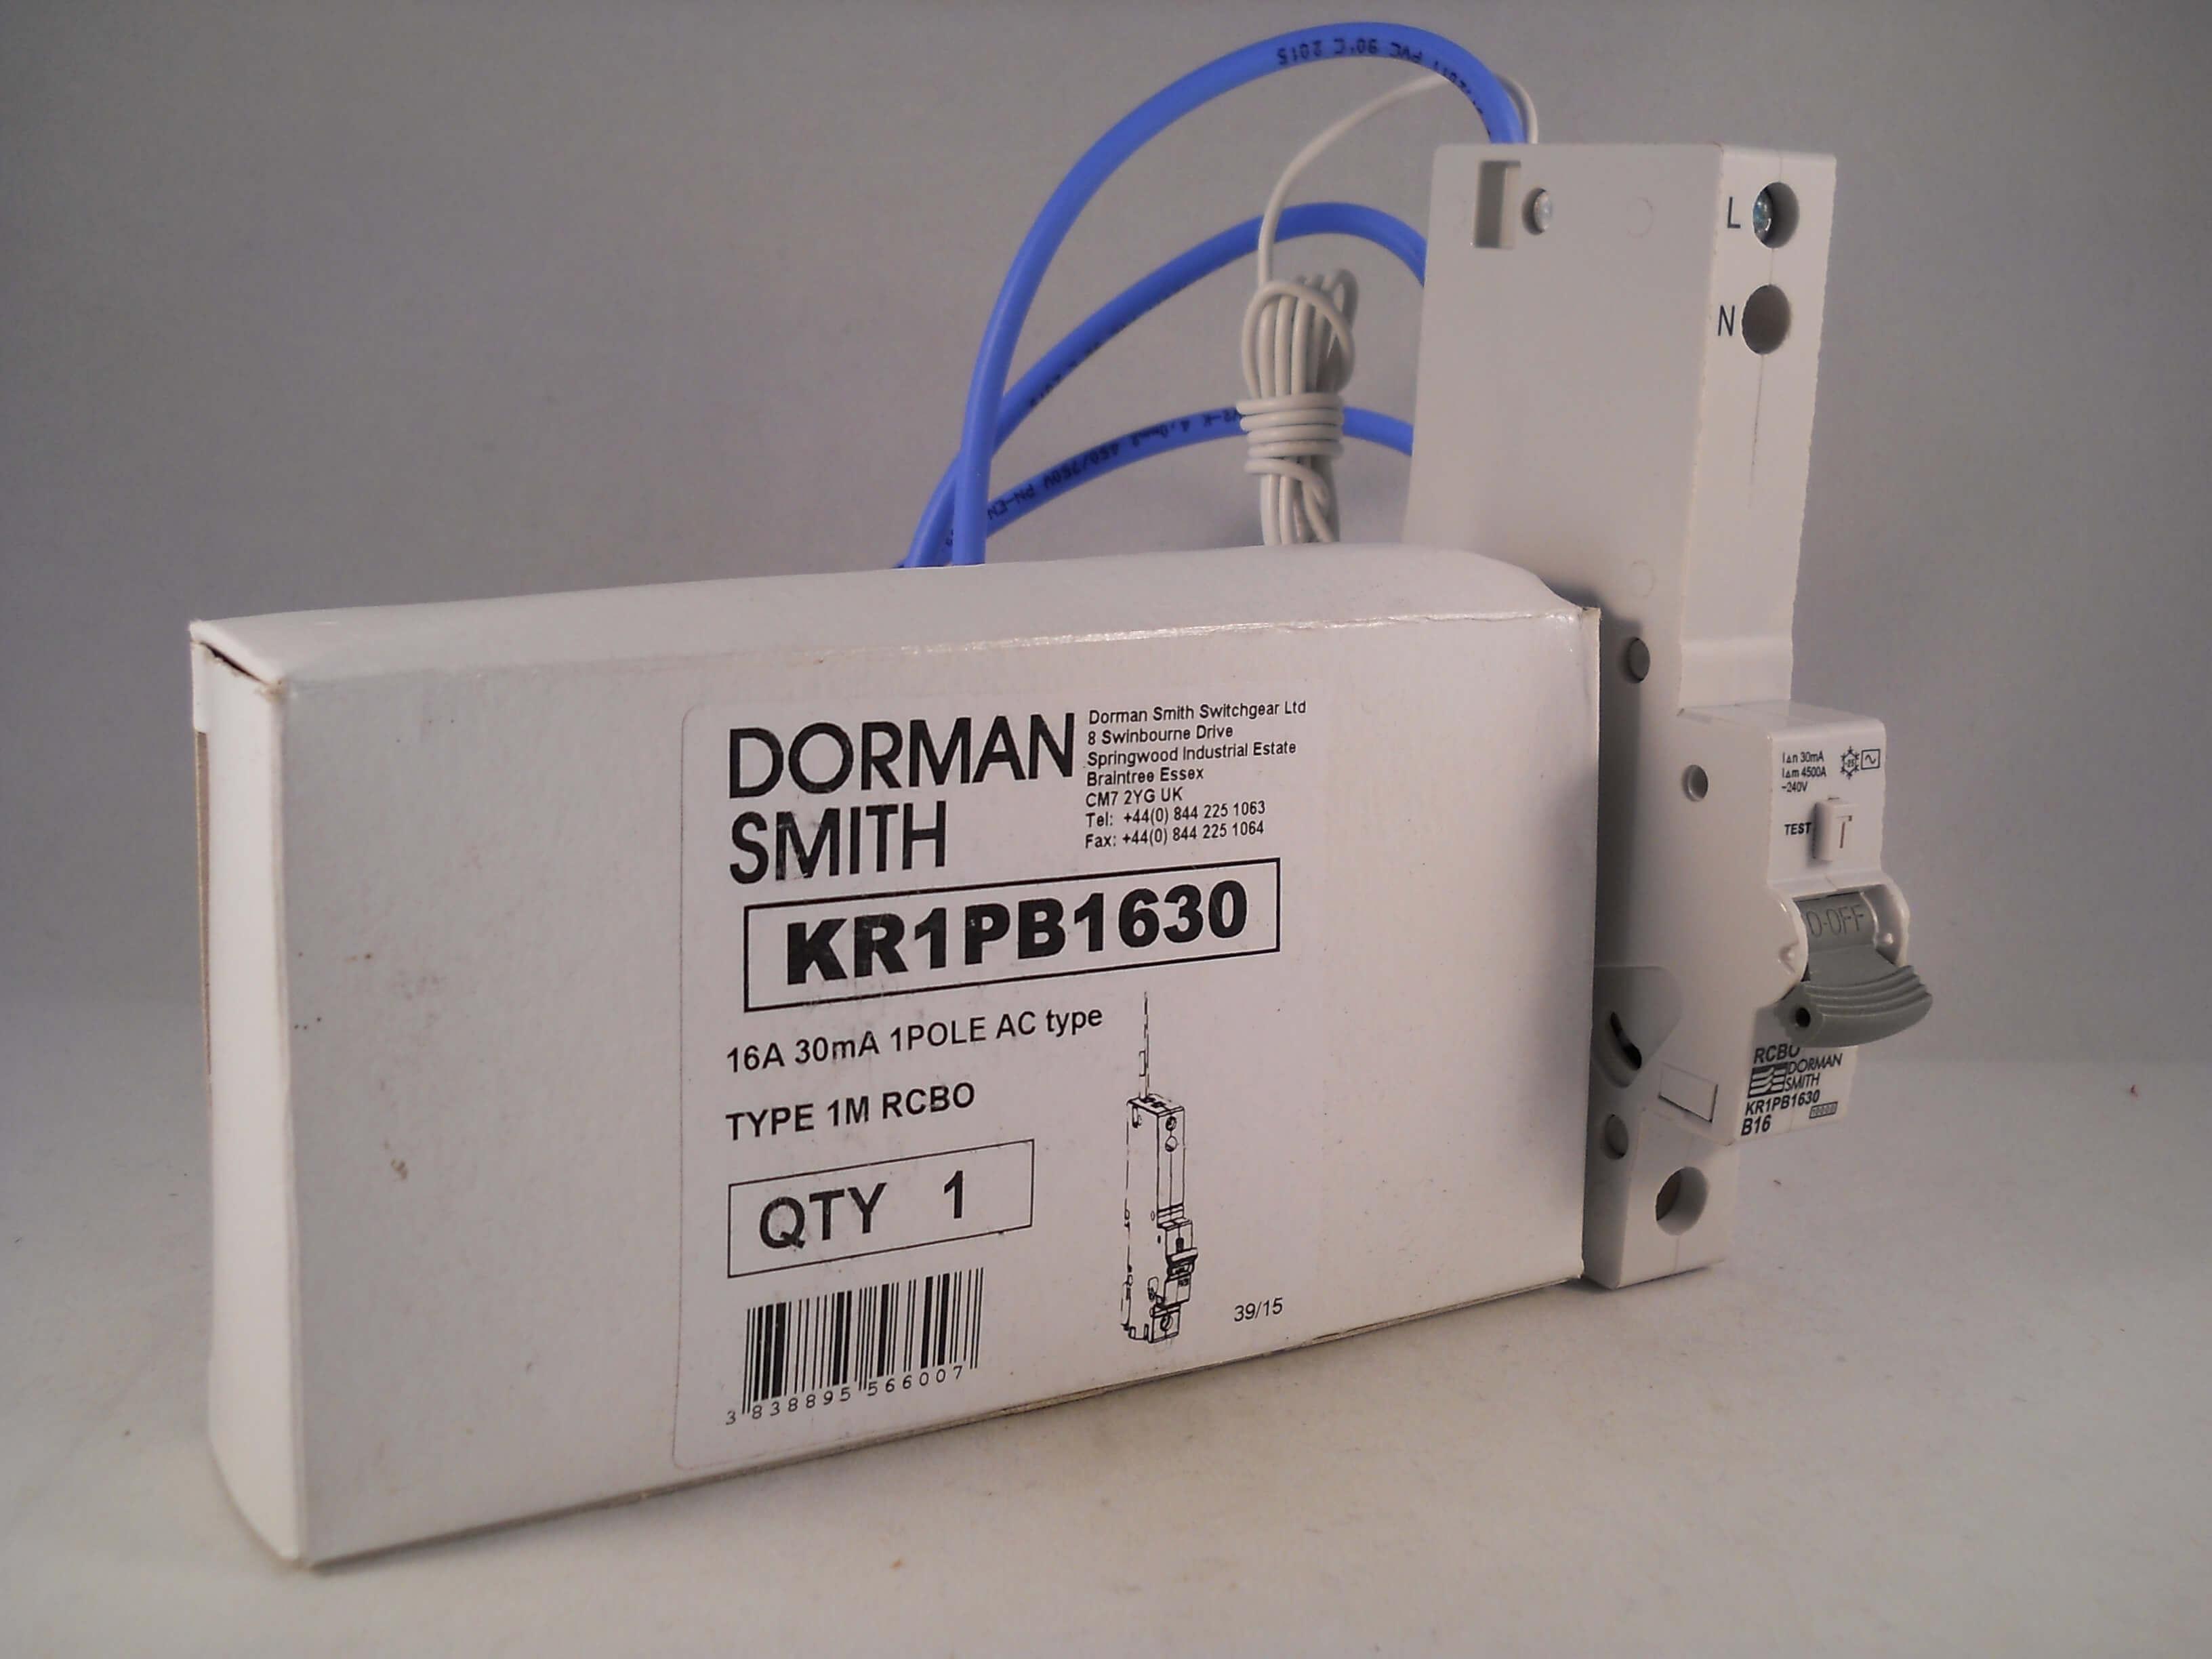 DORMAN SMITH AR2030 20AMP TYPE C RCBO Breaker 20 AMP M6